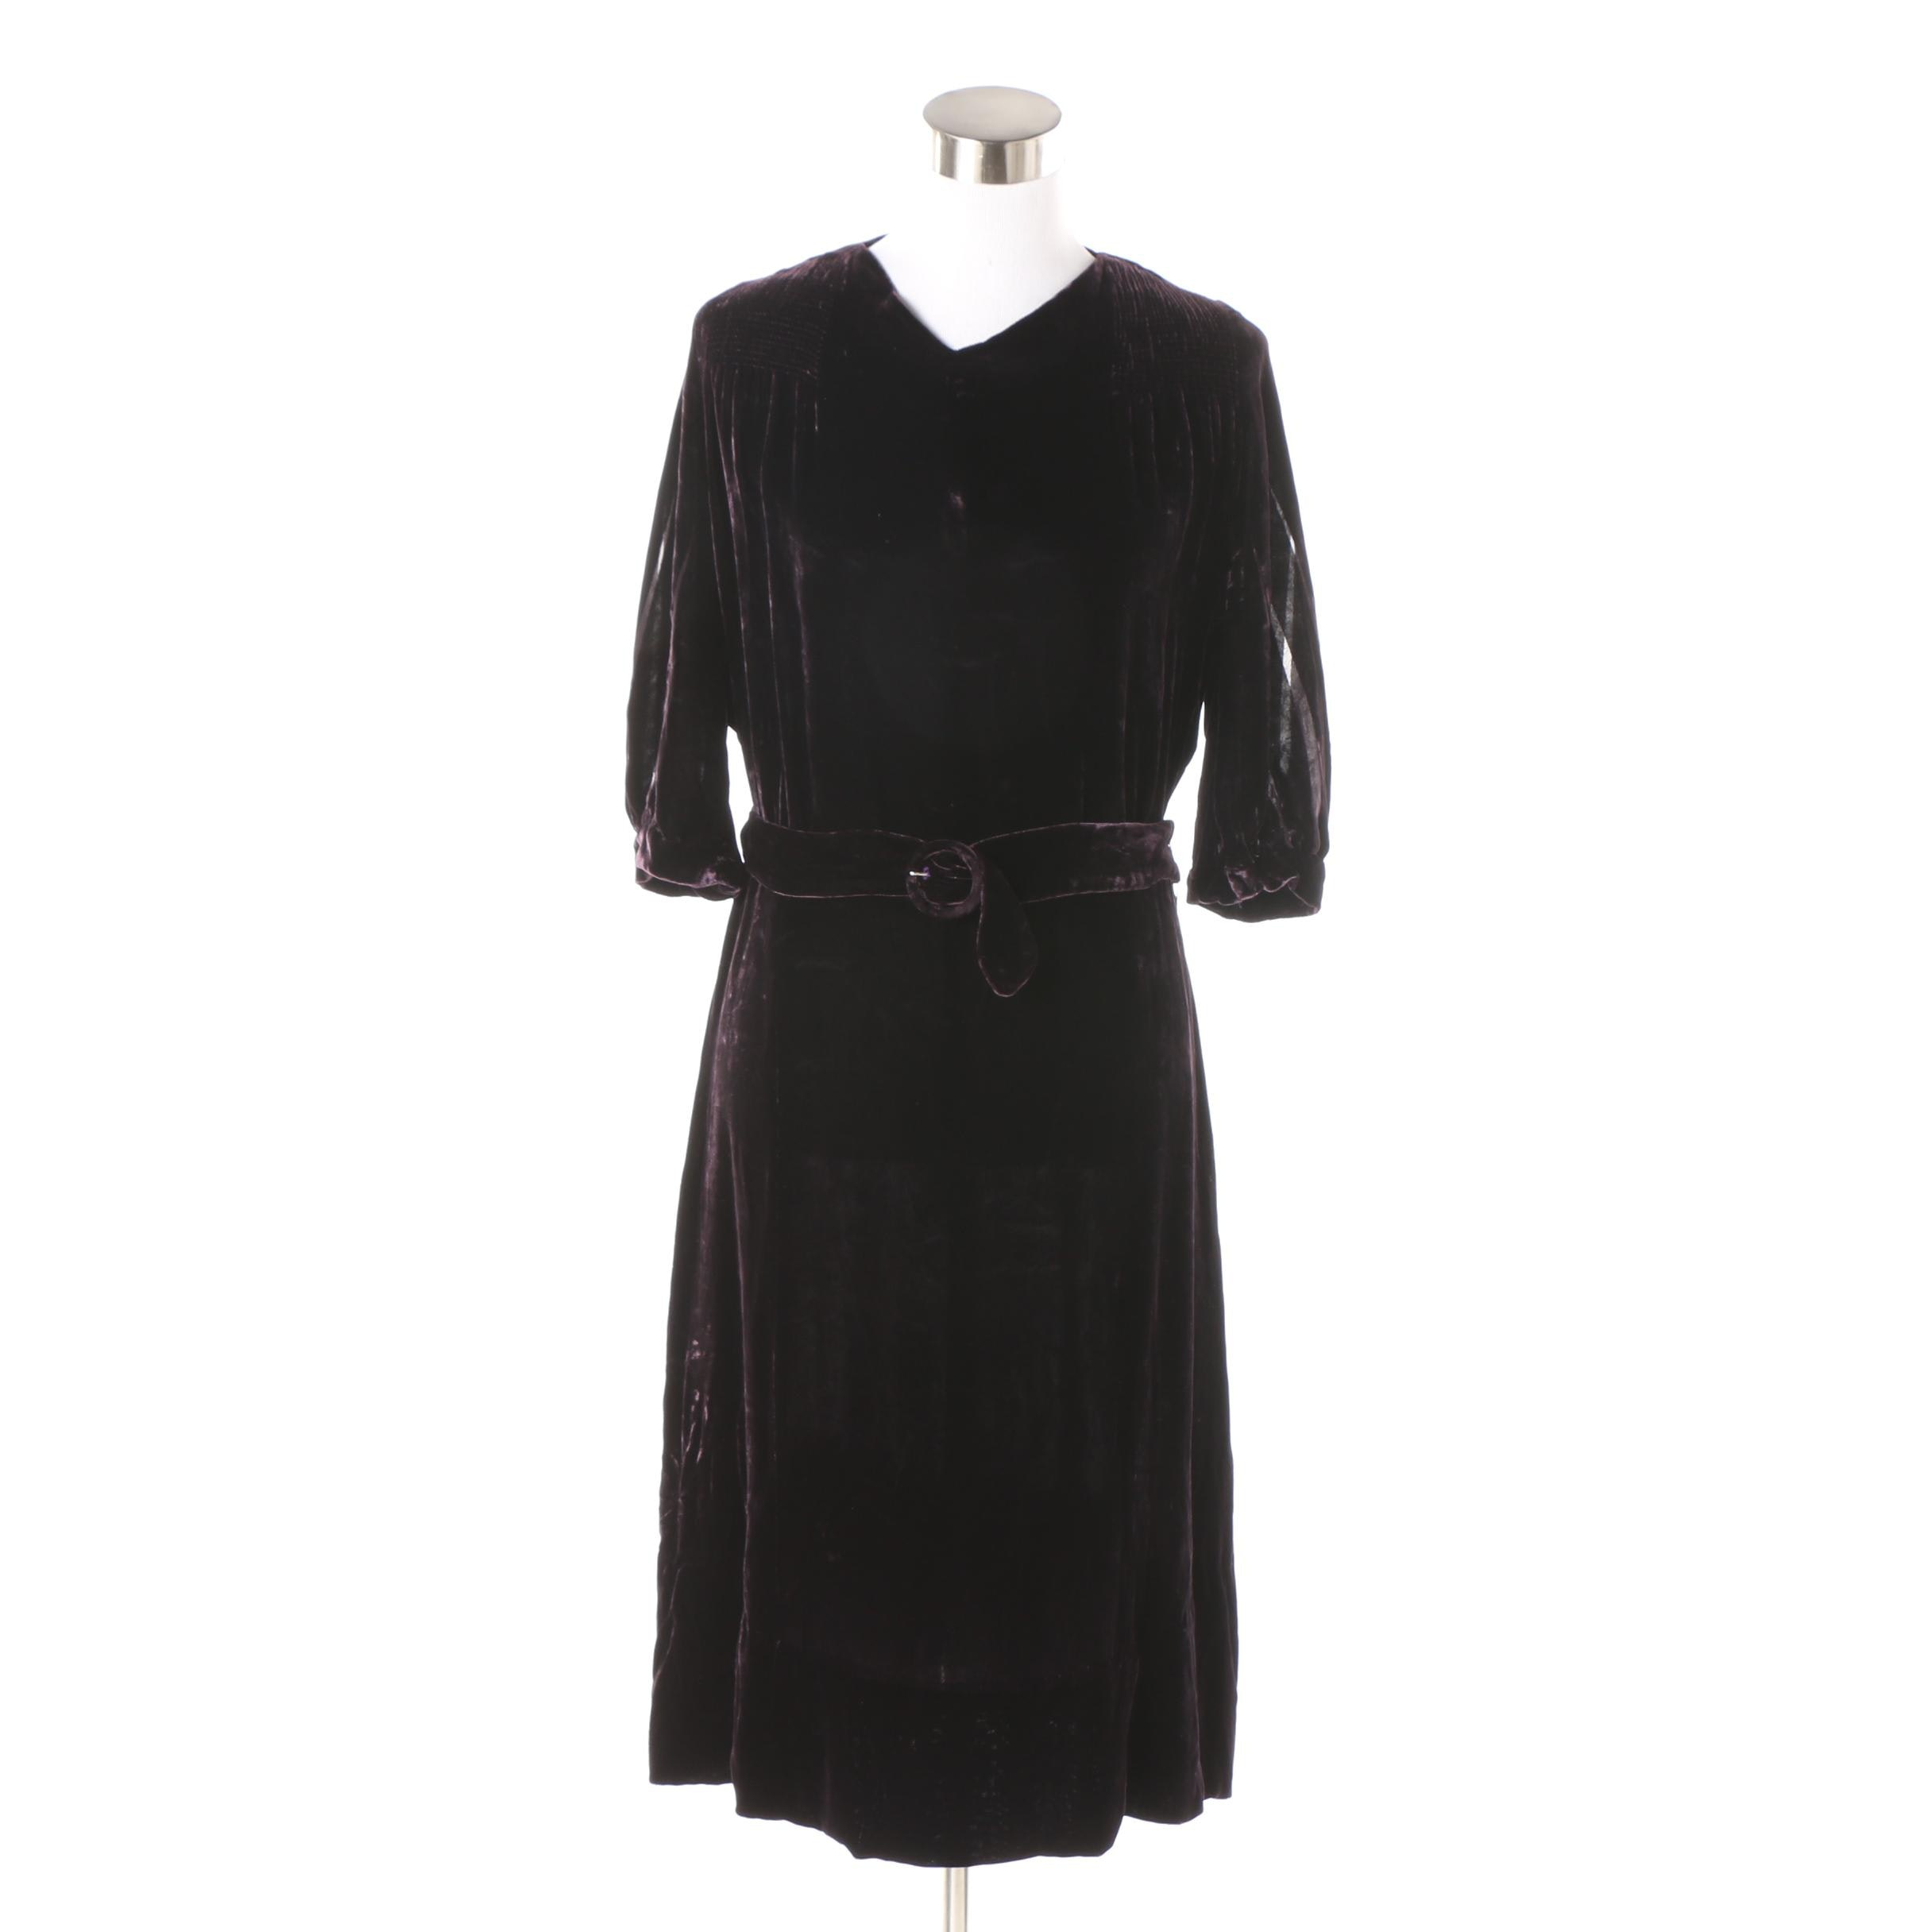 Circa 1930s Plum Velvet Dress with Belt and Sheer Striped Sleeve Detail